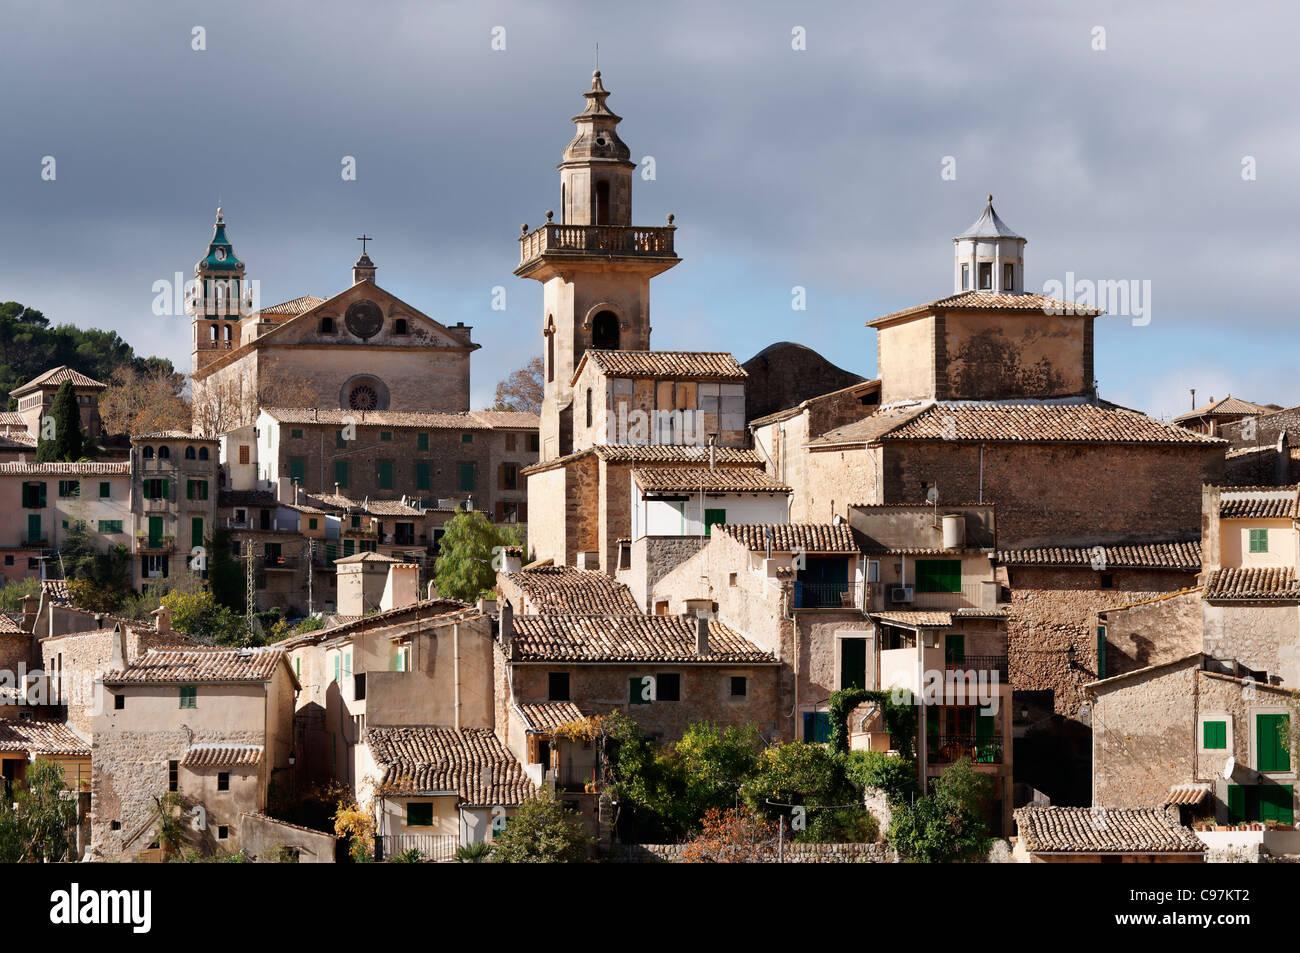 Chartreuse Cloister, Valldemossa, Majorca, Spain - Stock Image